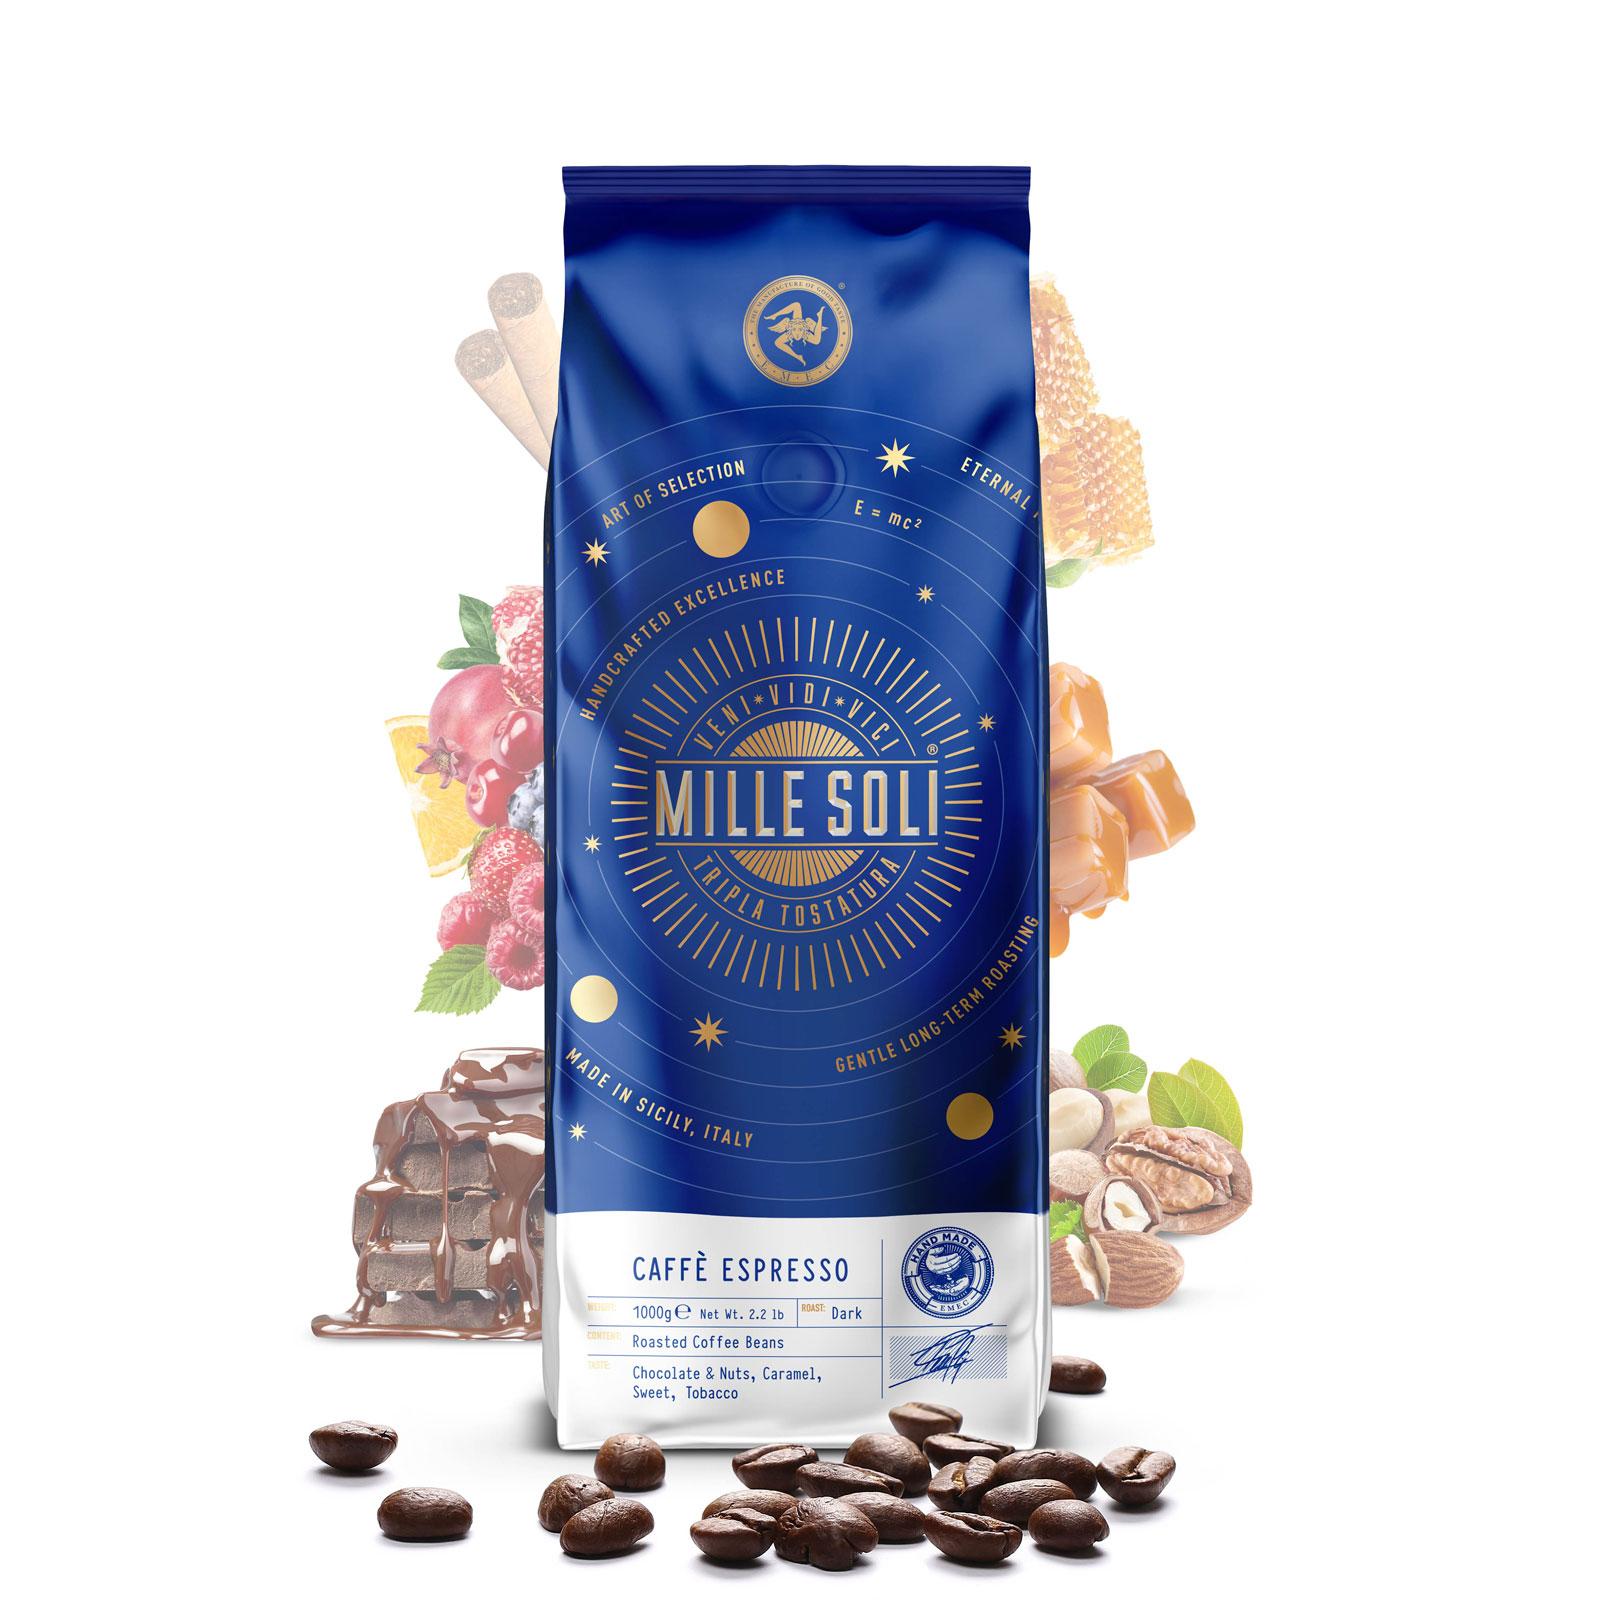 MILLE SOLI - Caffè Espresso - 1000g - Bohnen